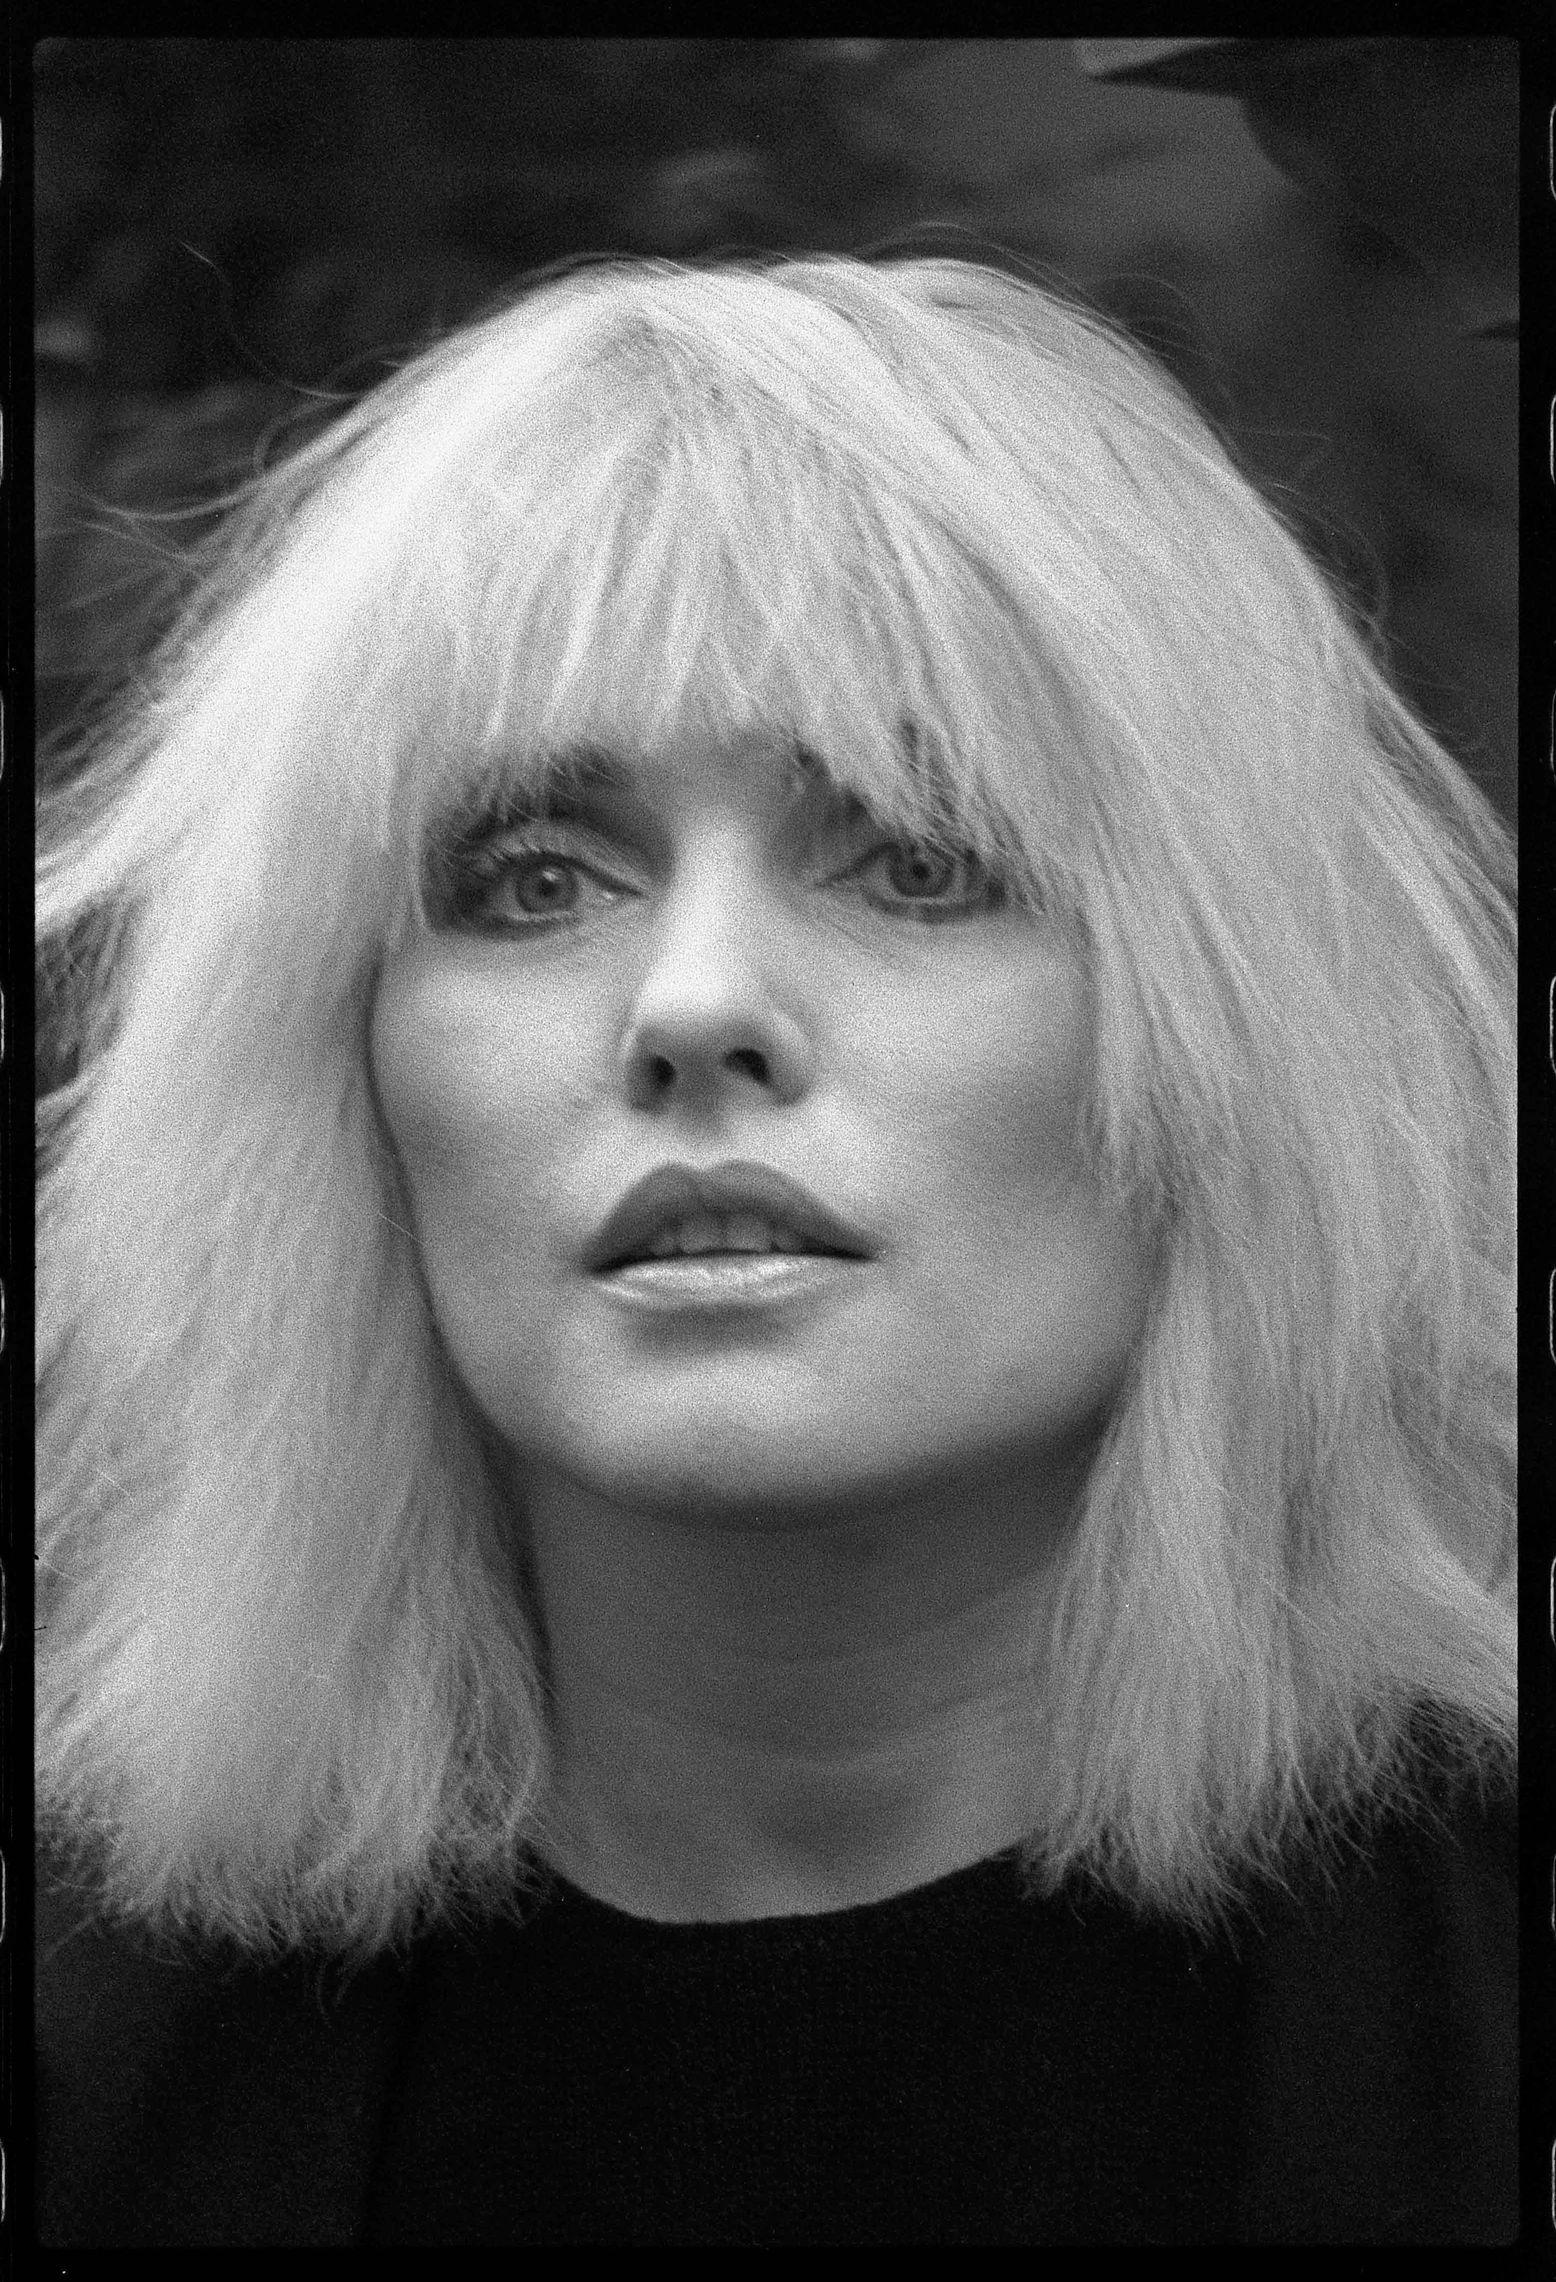 Debbie Harry of Blondie at the Ritz Hotel, London 20 November 1983